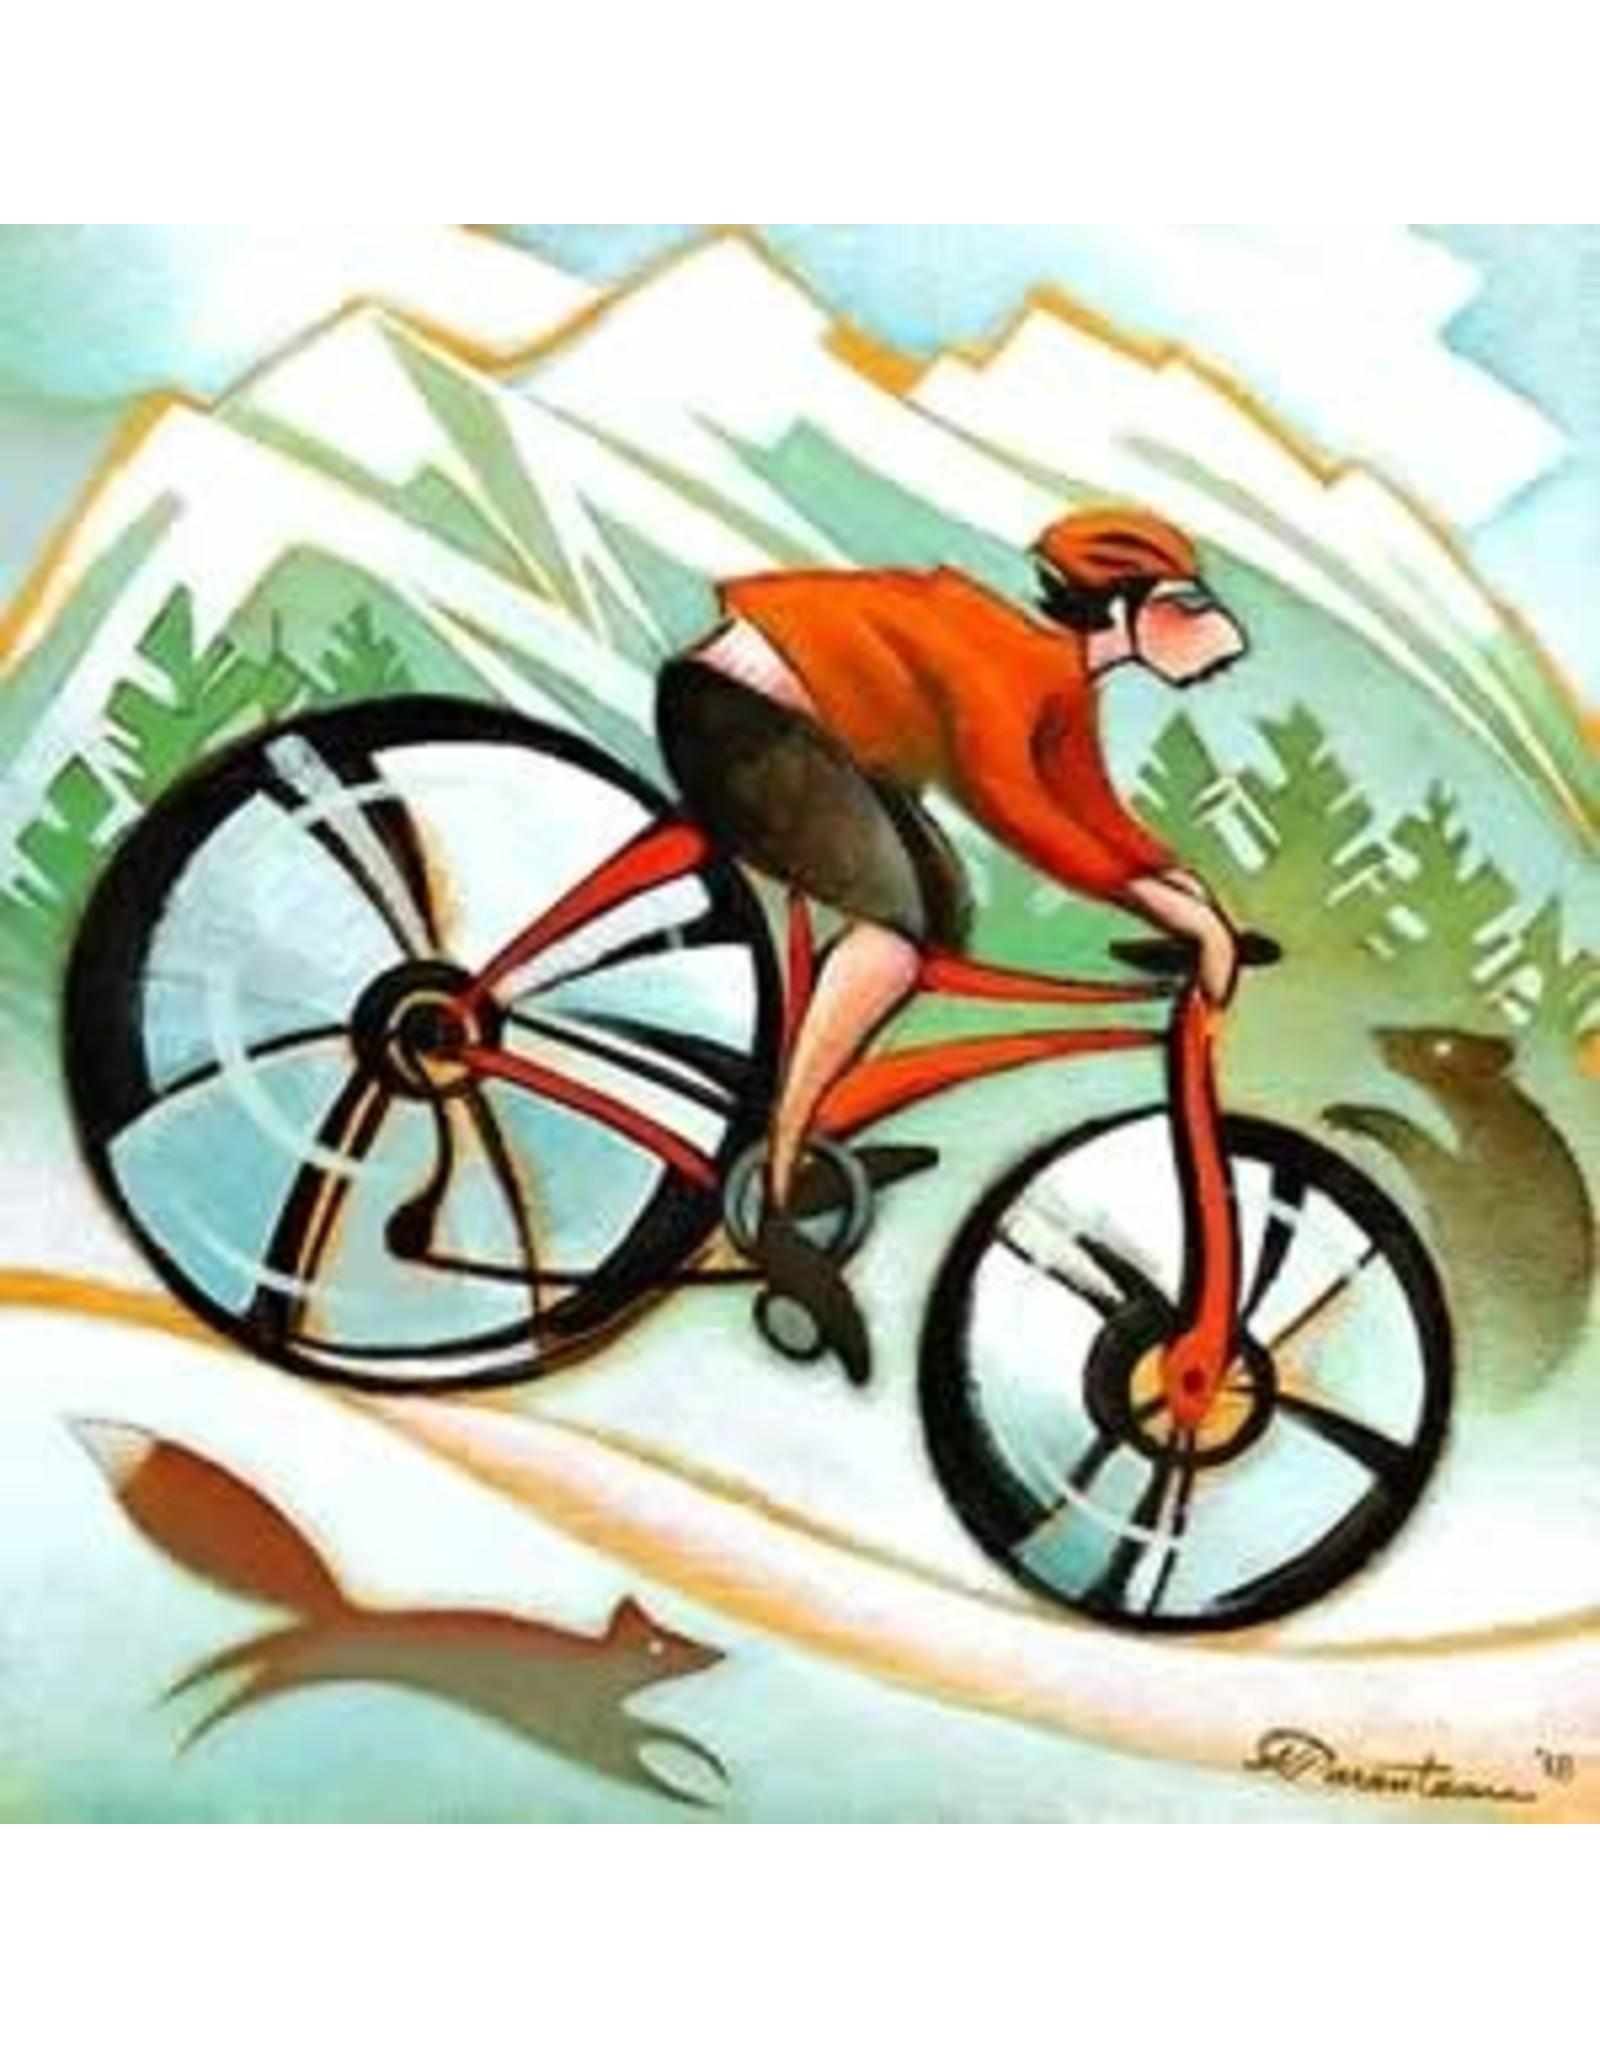 Nathalie Parenteau Boreal Biking | Nathalie Parenteau